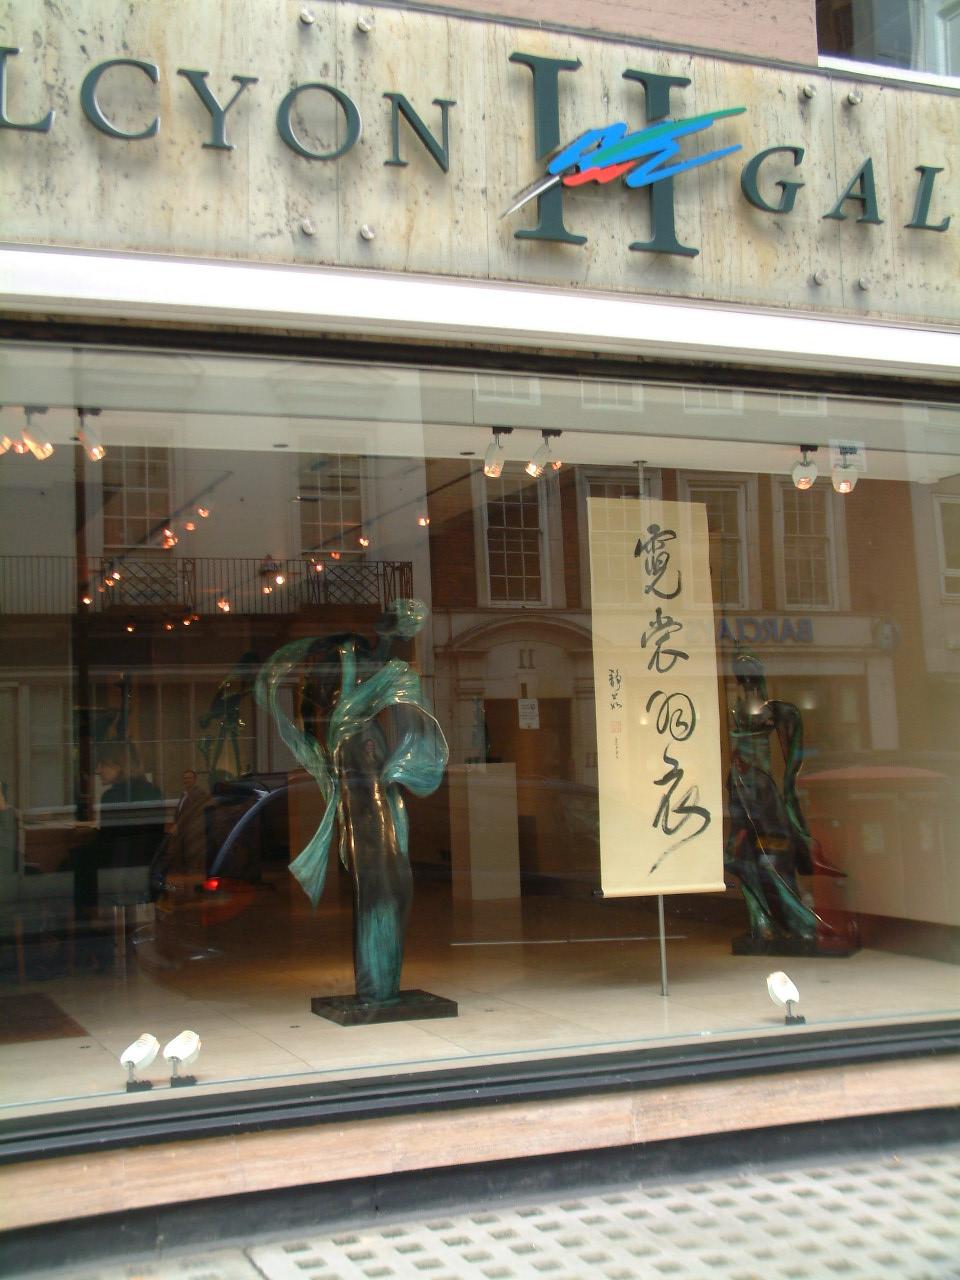 exhibitionimage3.JPG